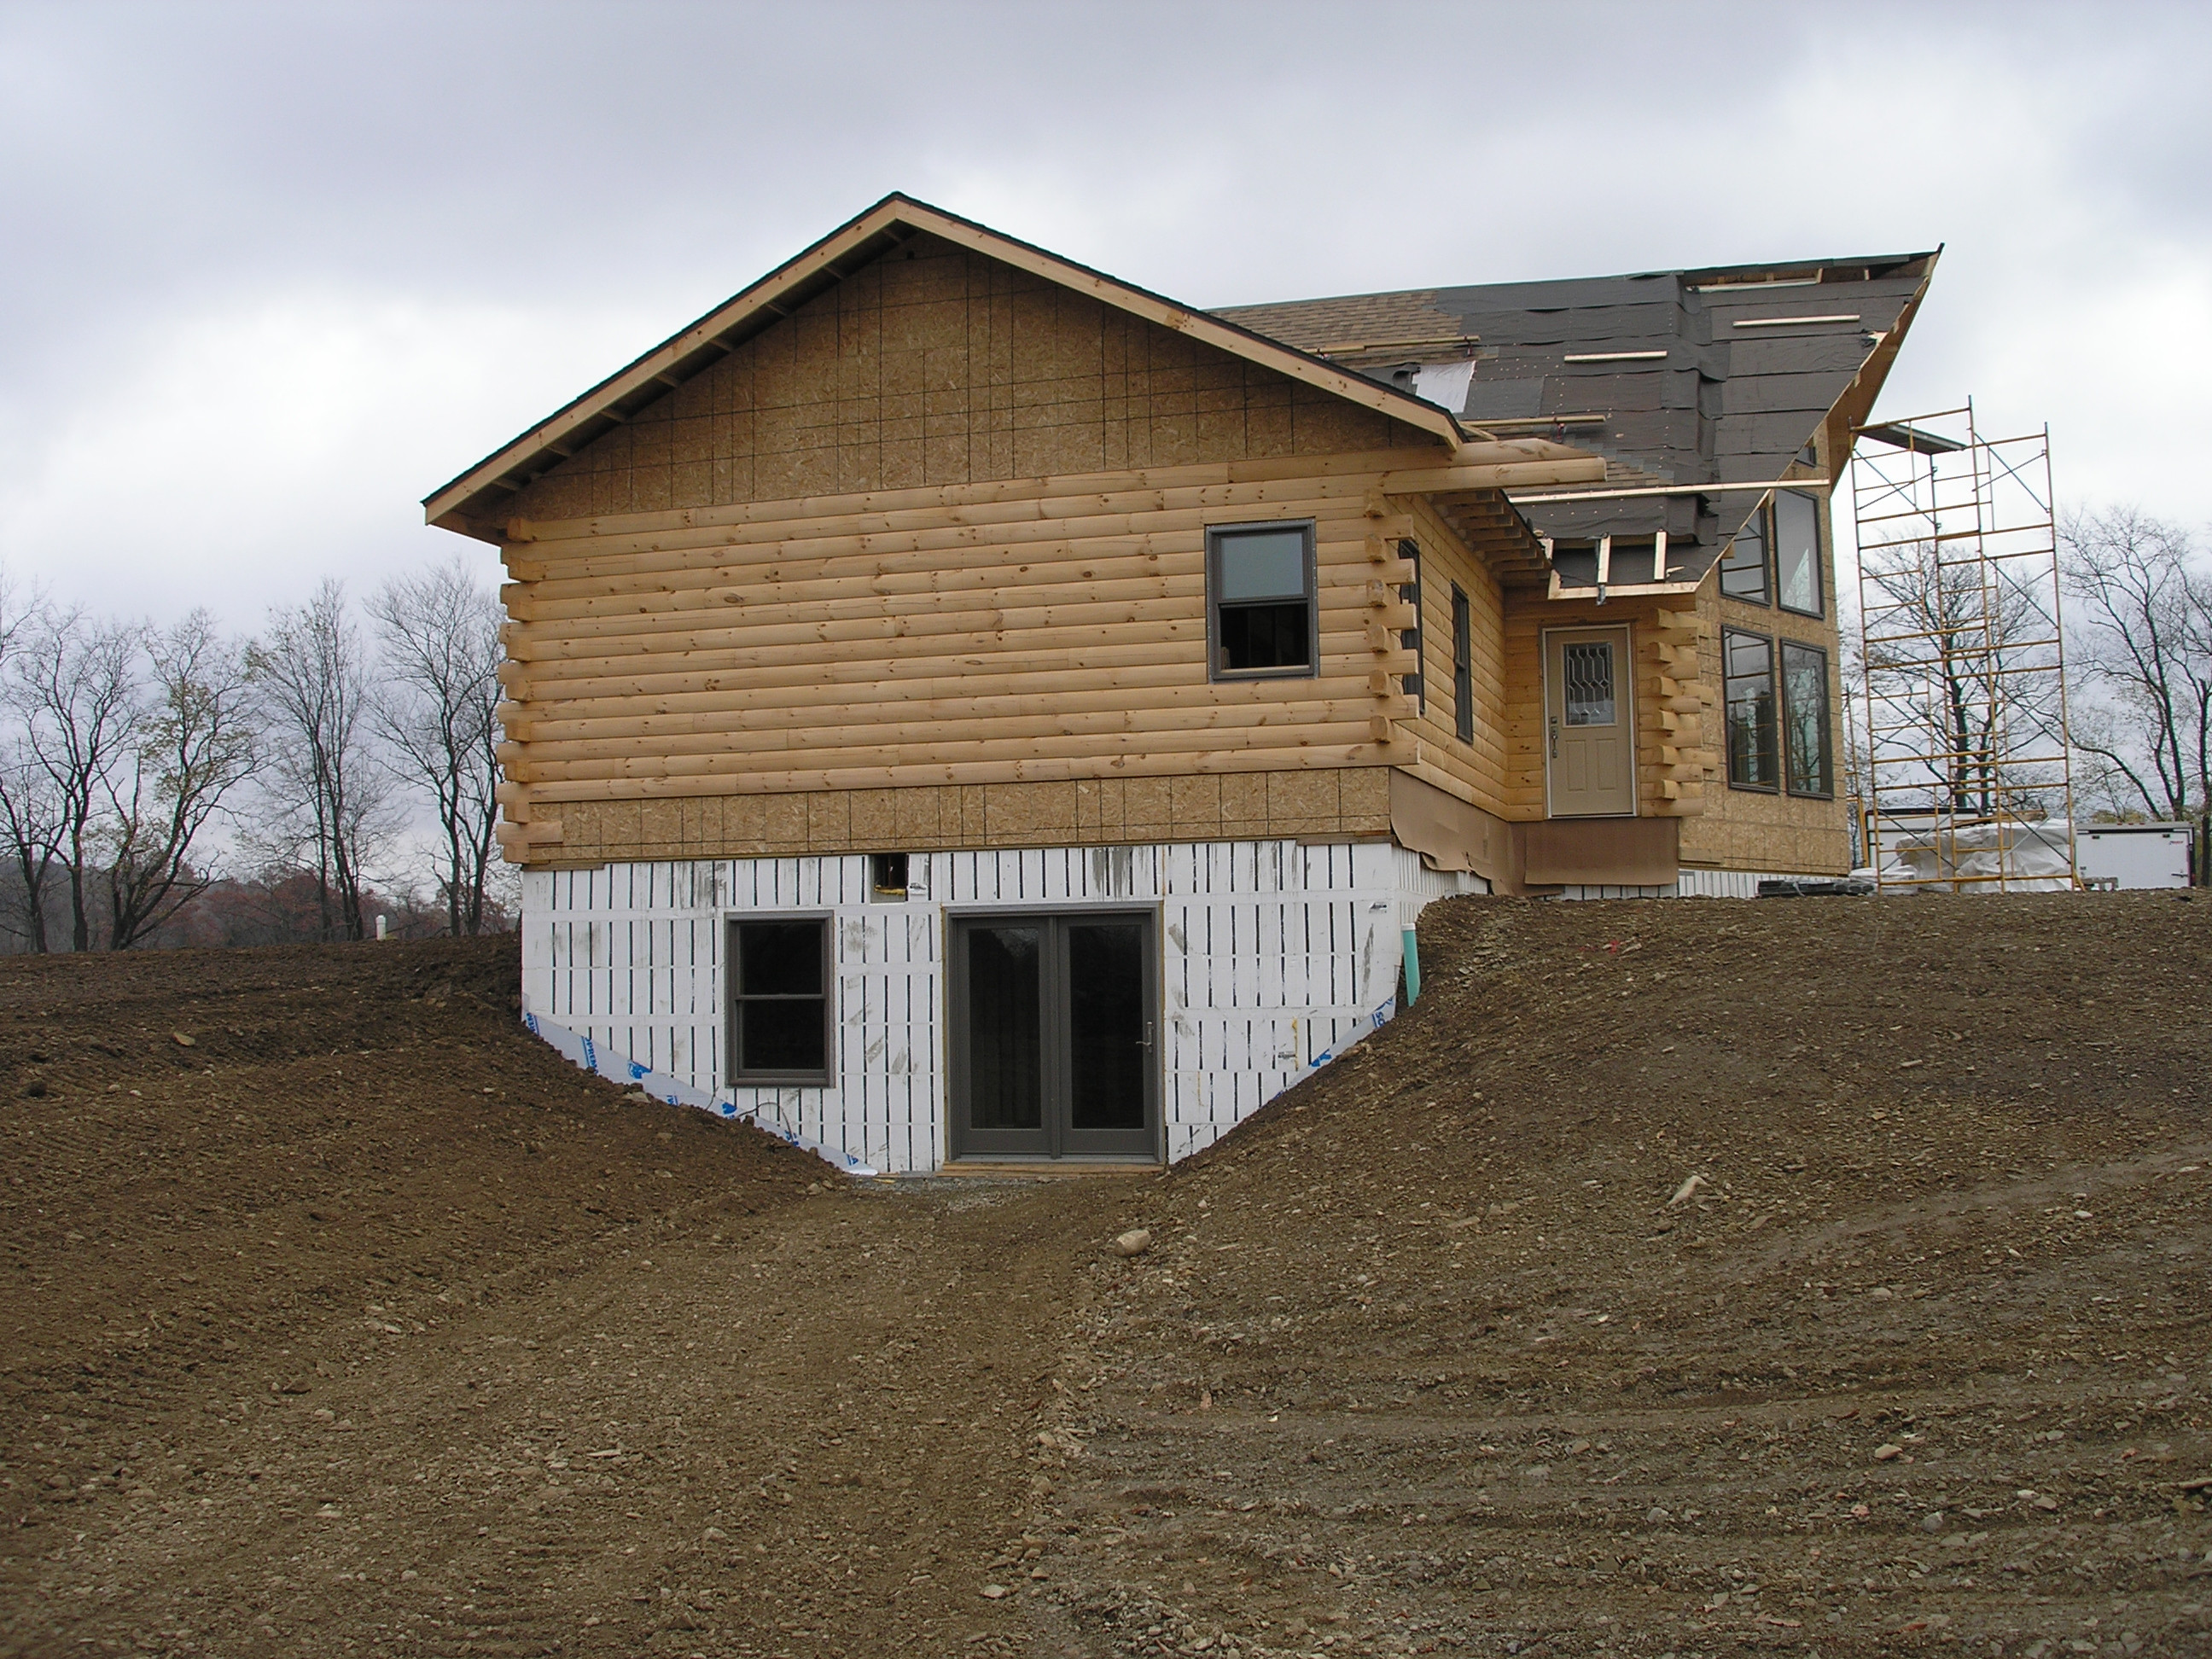 Best ideas about Daylight Basement Ideas . Save or Pin 13 Best House Plans With Daylight Basement Ideas Now.